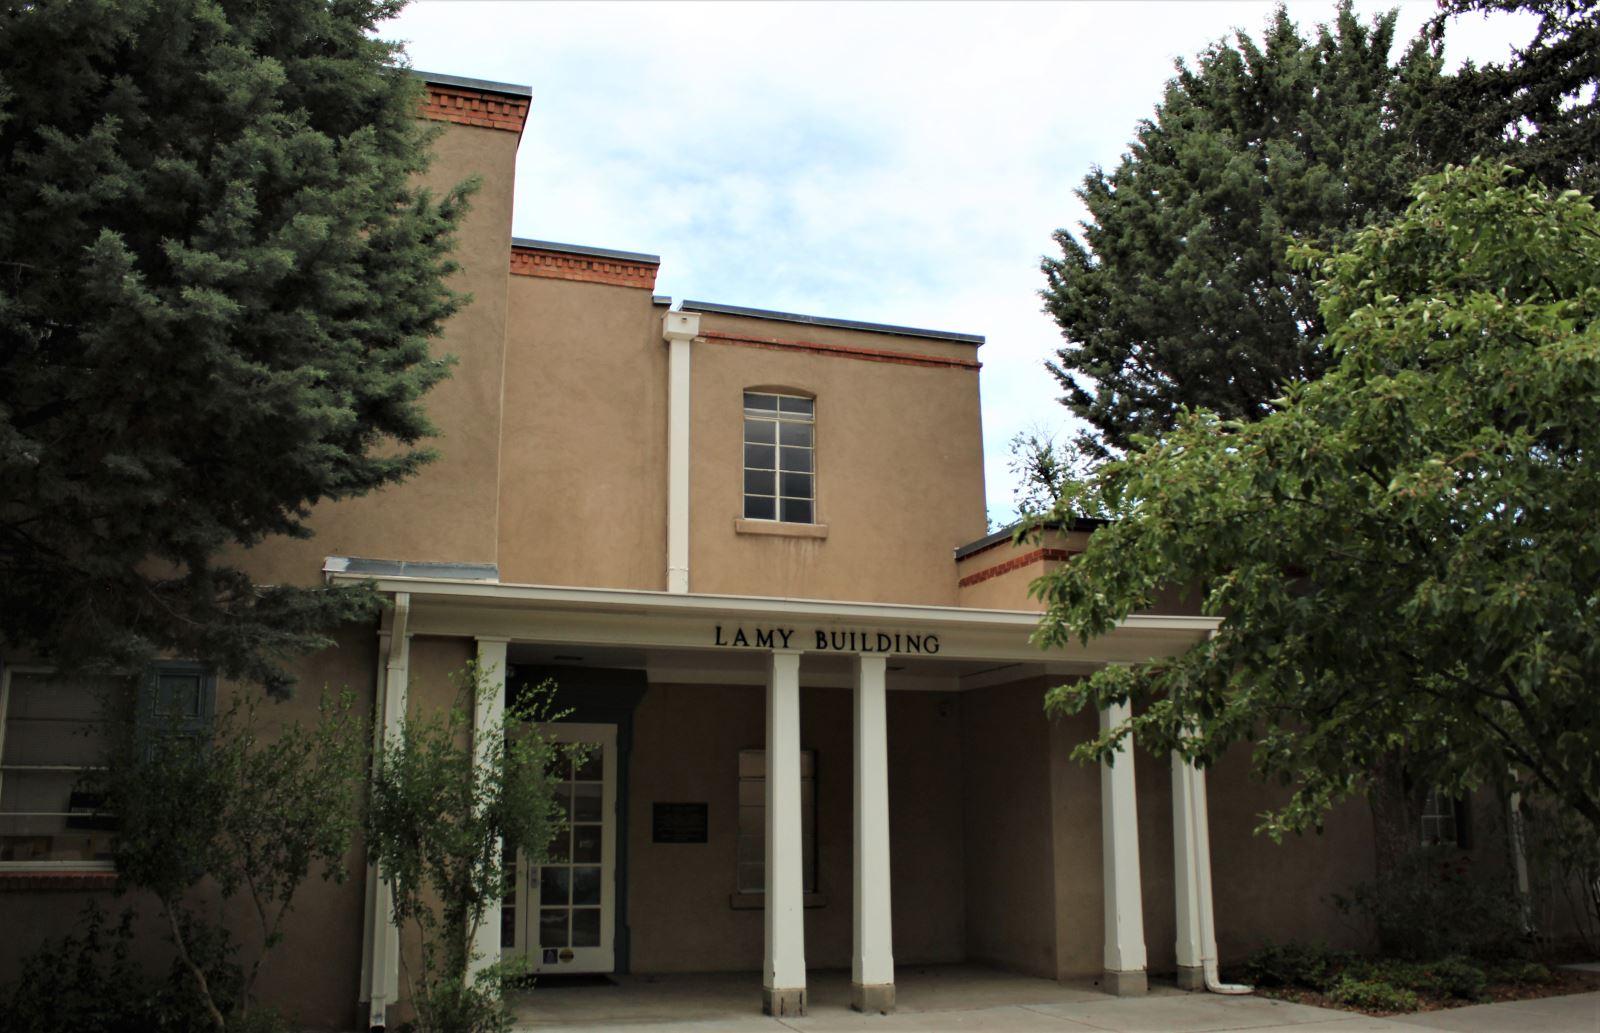 Lamy Building